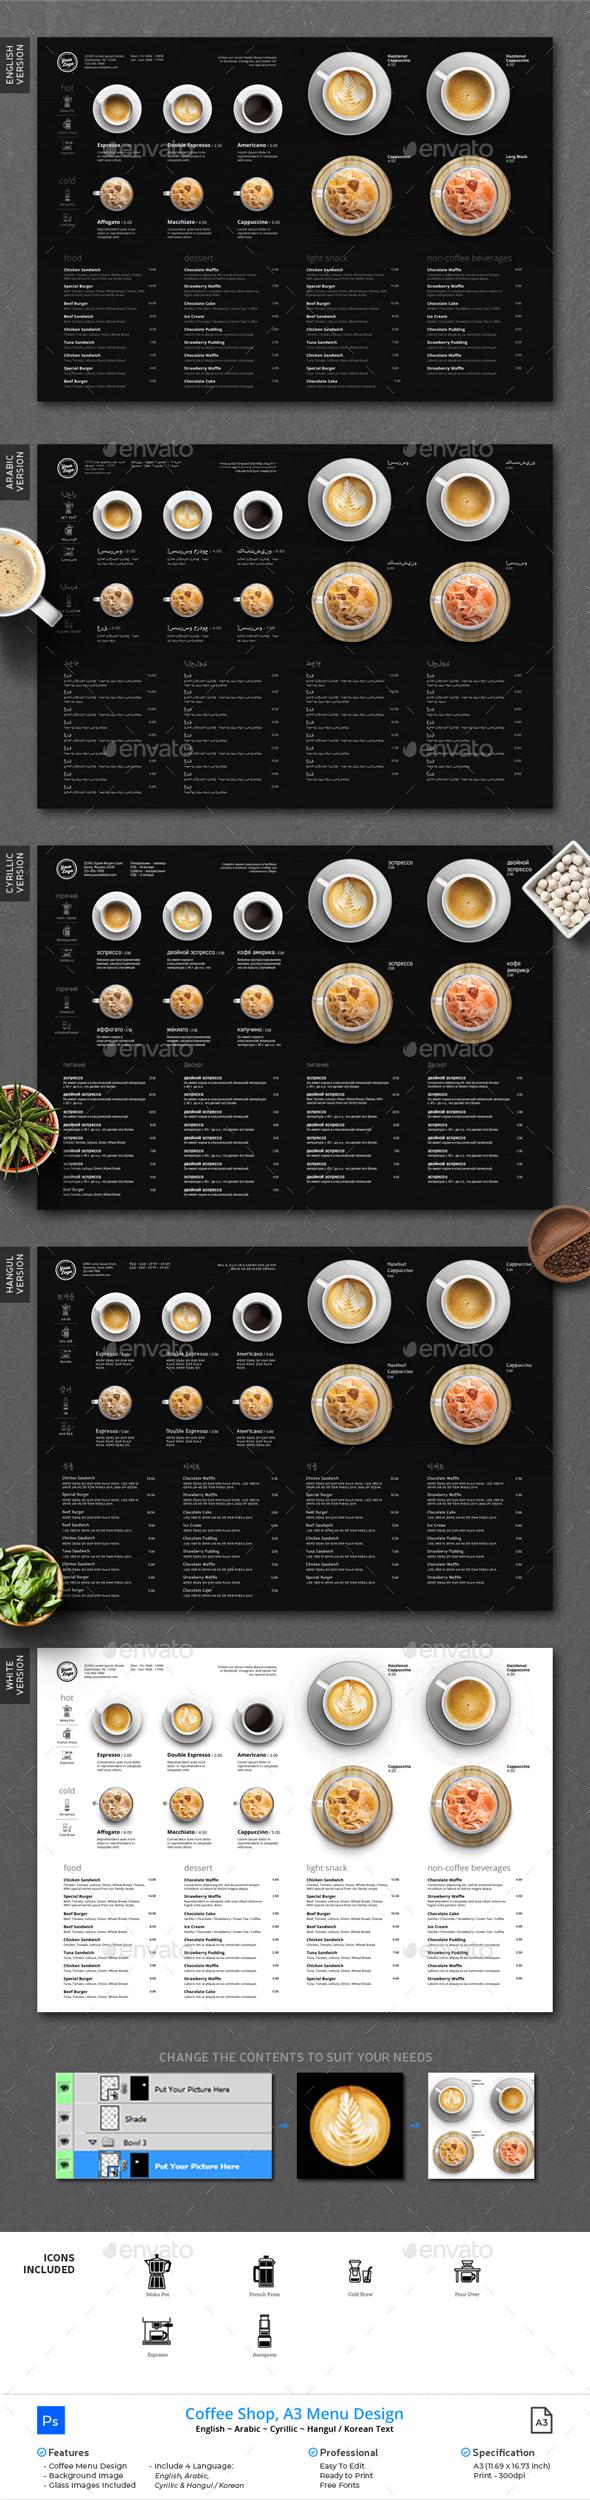 Minimalist Photography Coffee Menu A3 - Food Menus Print Templates